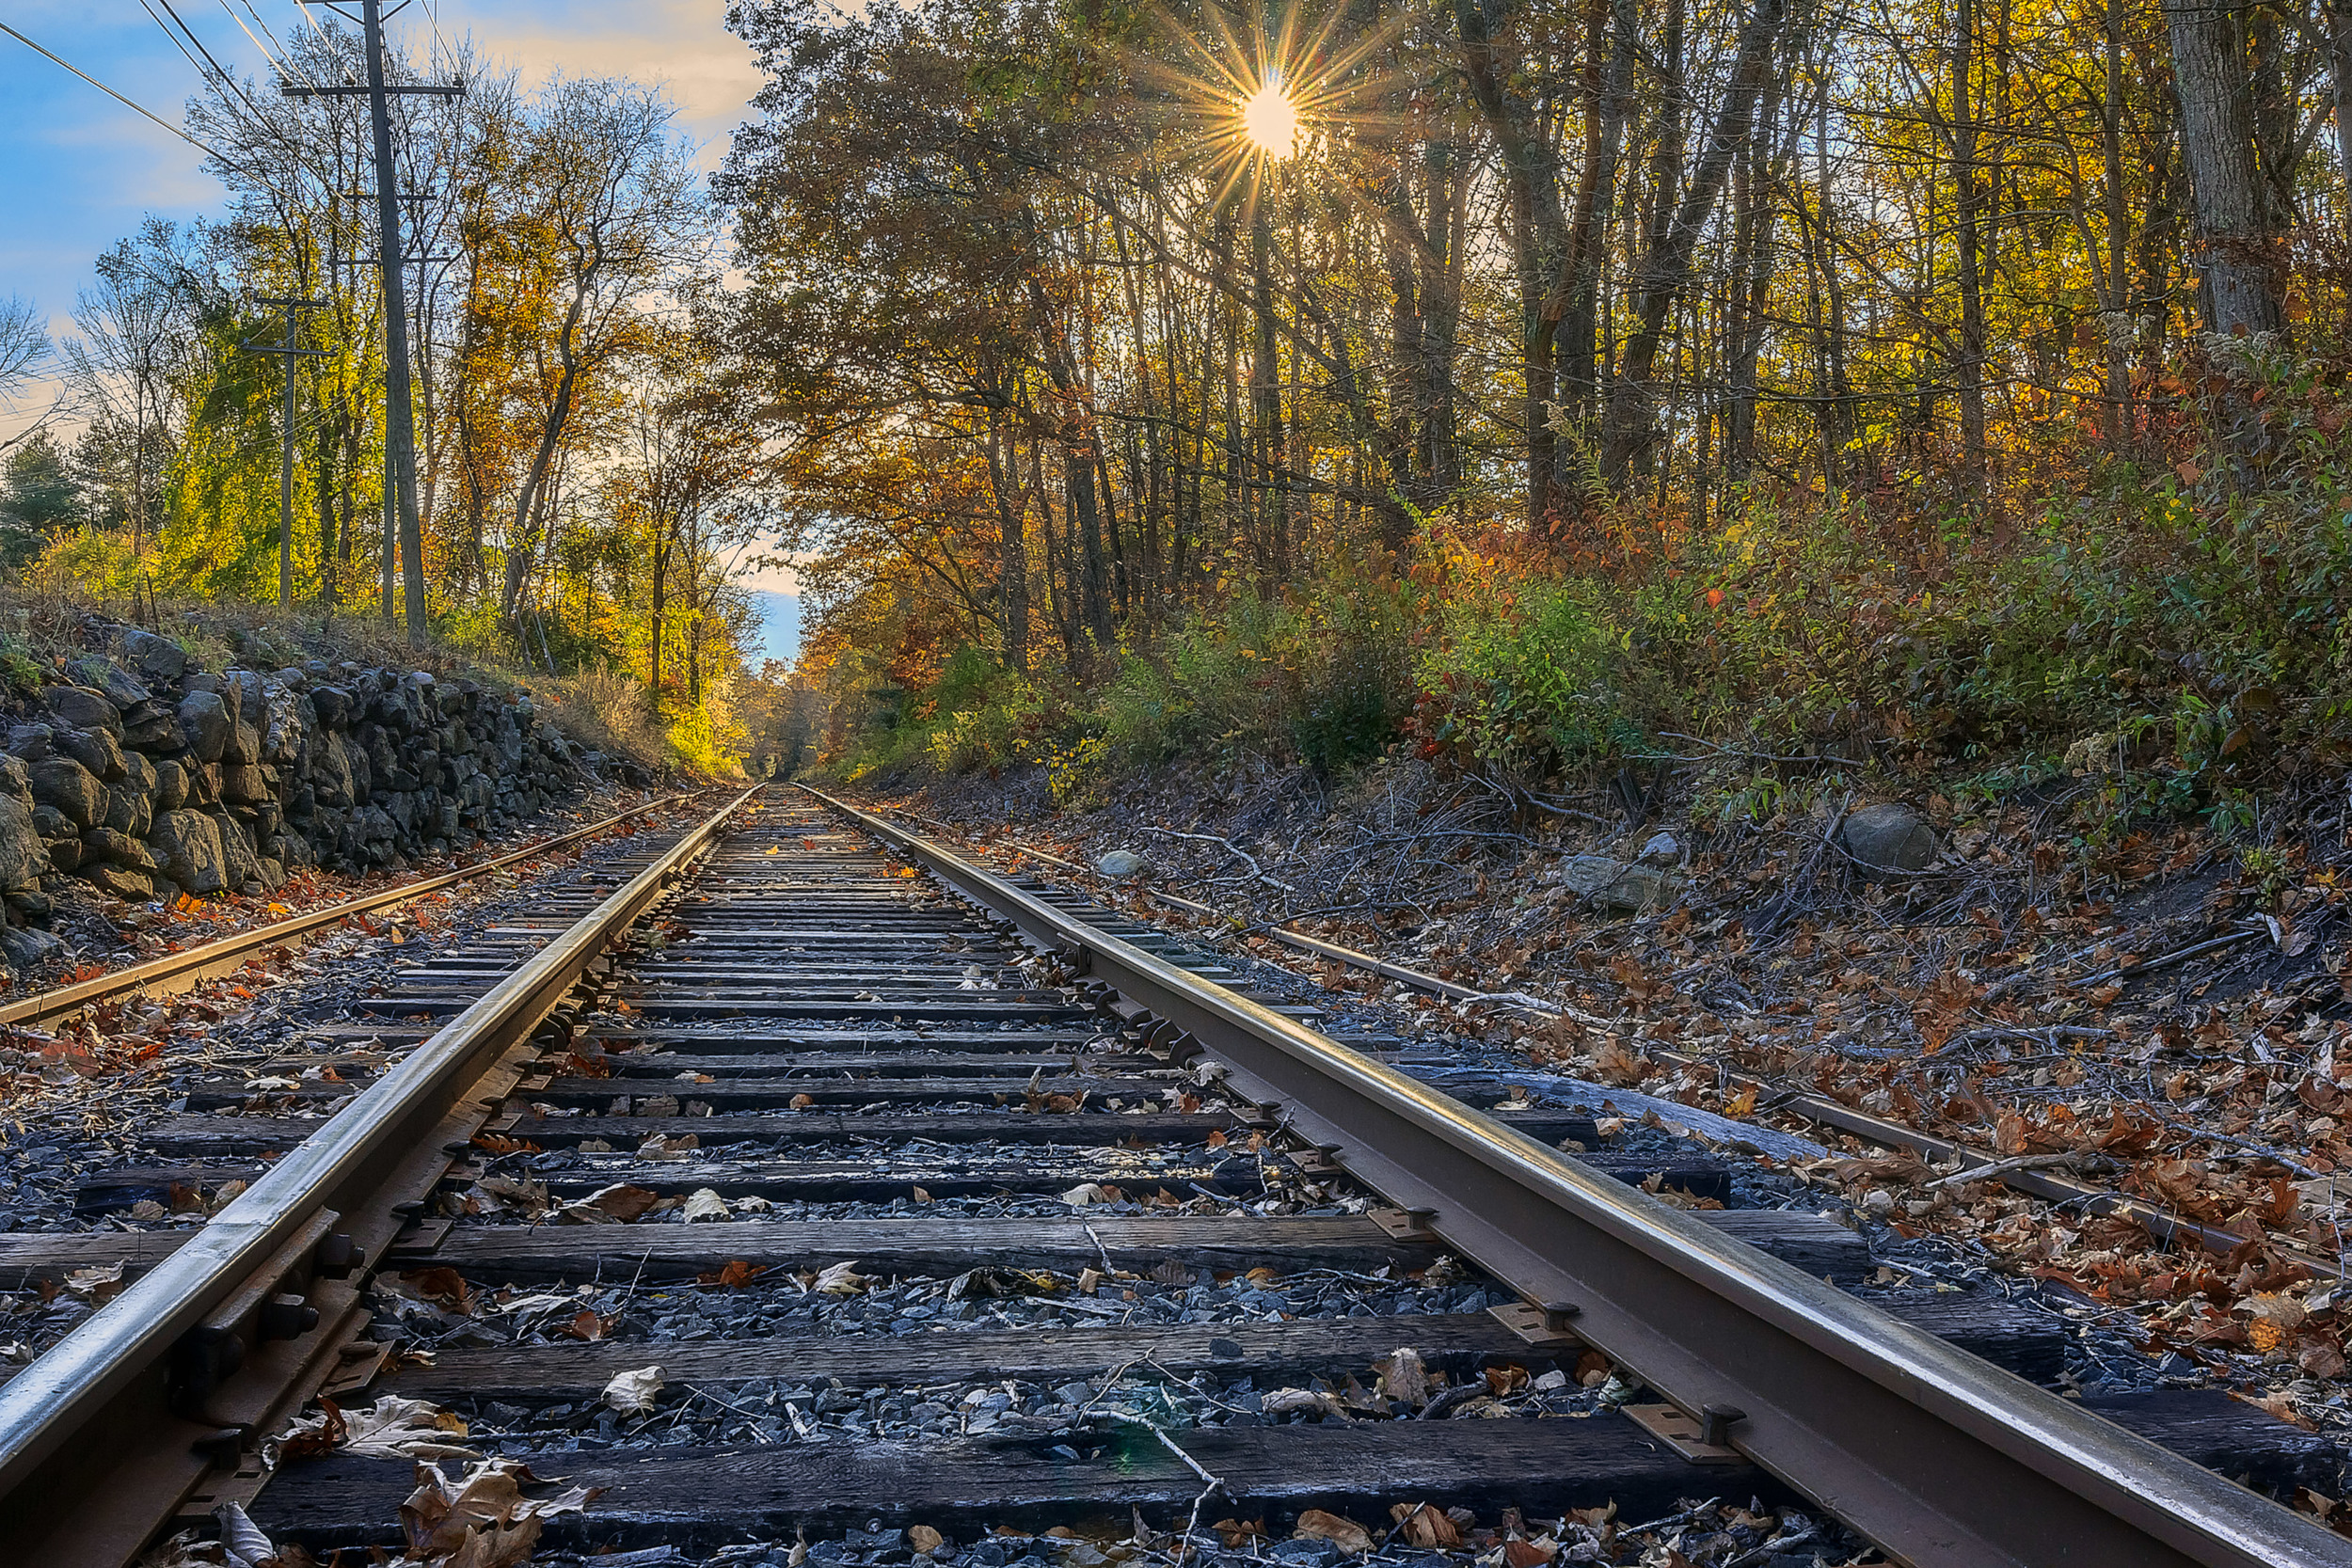 Sunburst By The Tracks